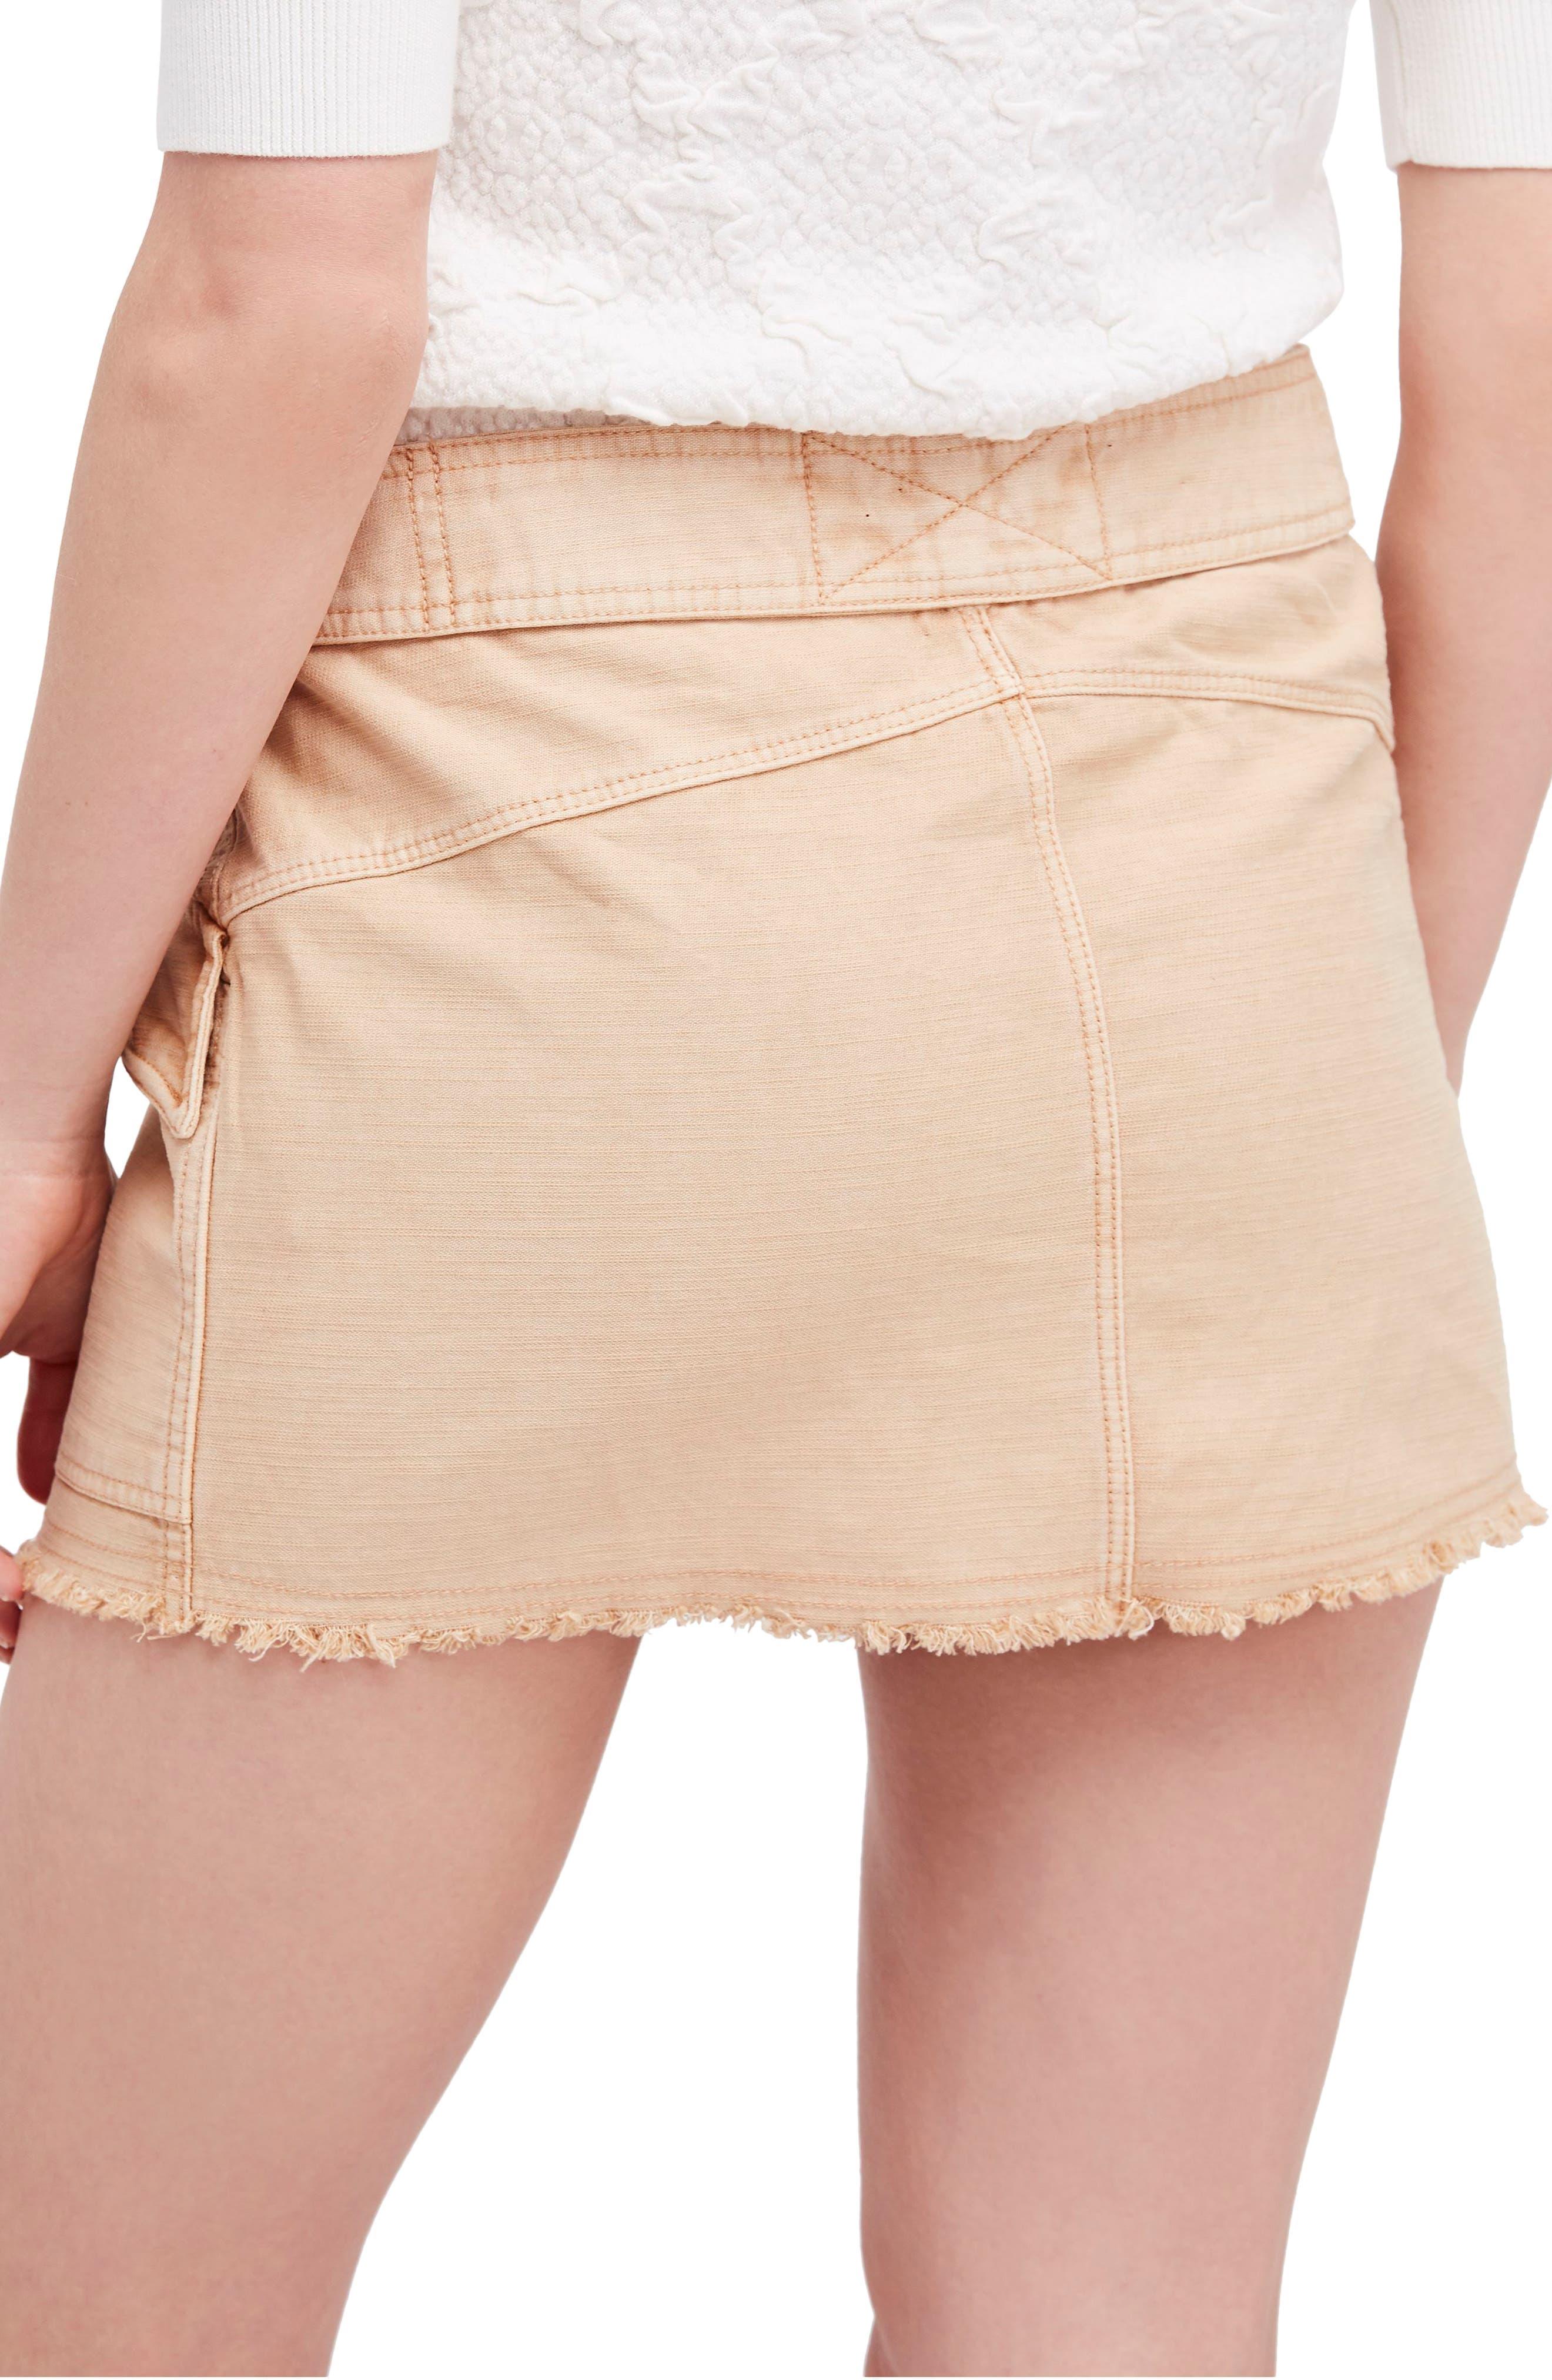 Hangin' On Tight Miniskirt,                             Alternate thumbnail 3, color,